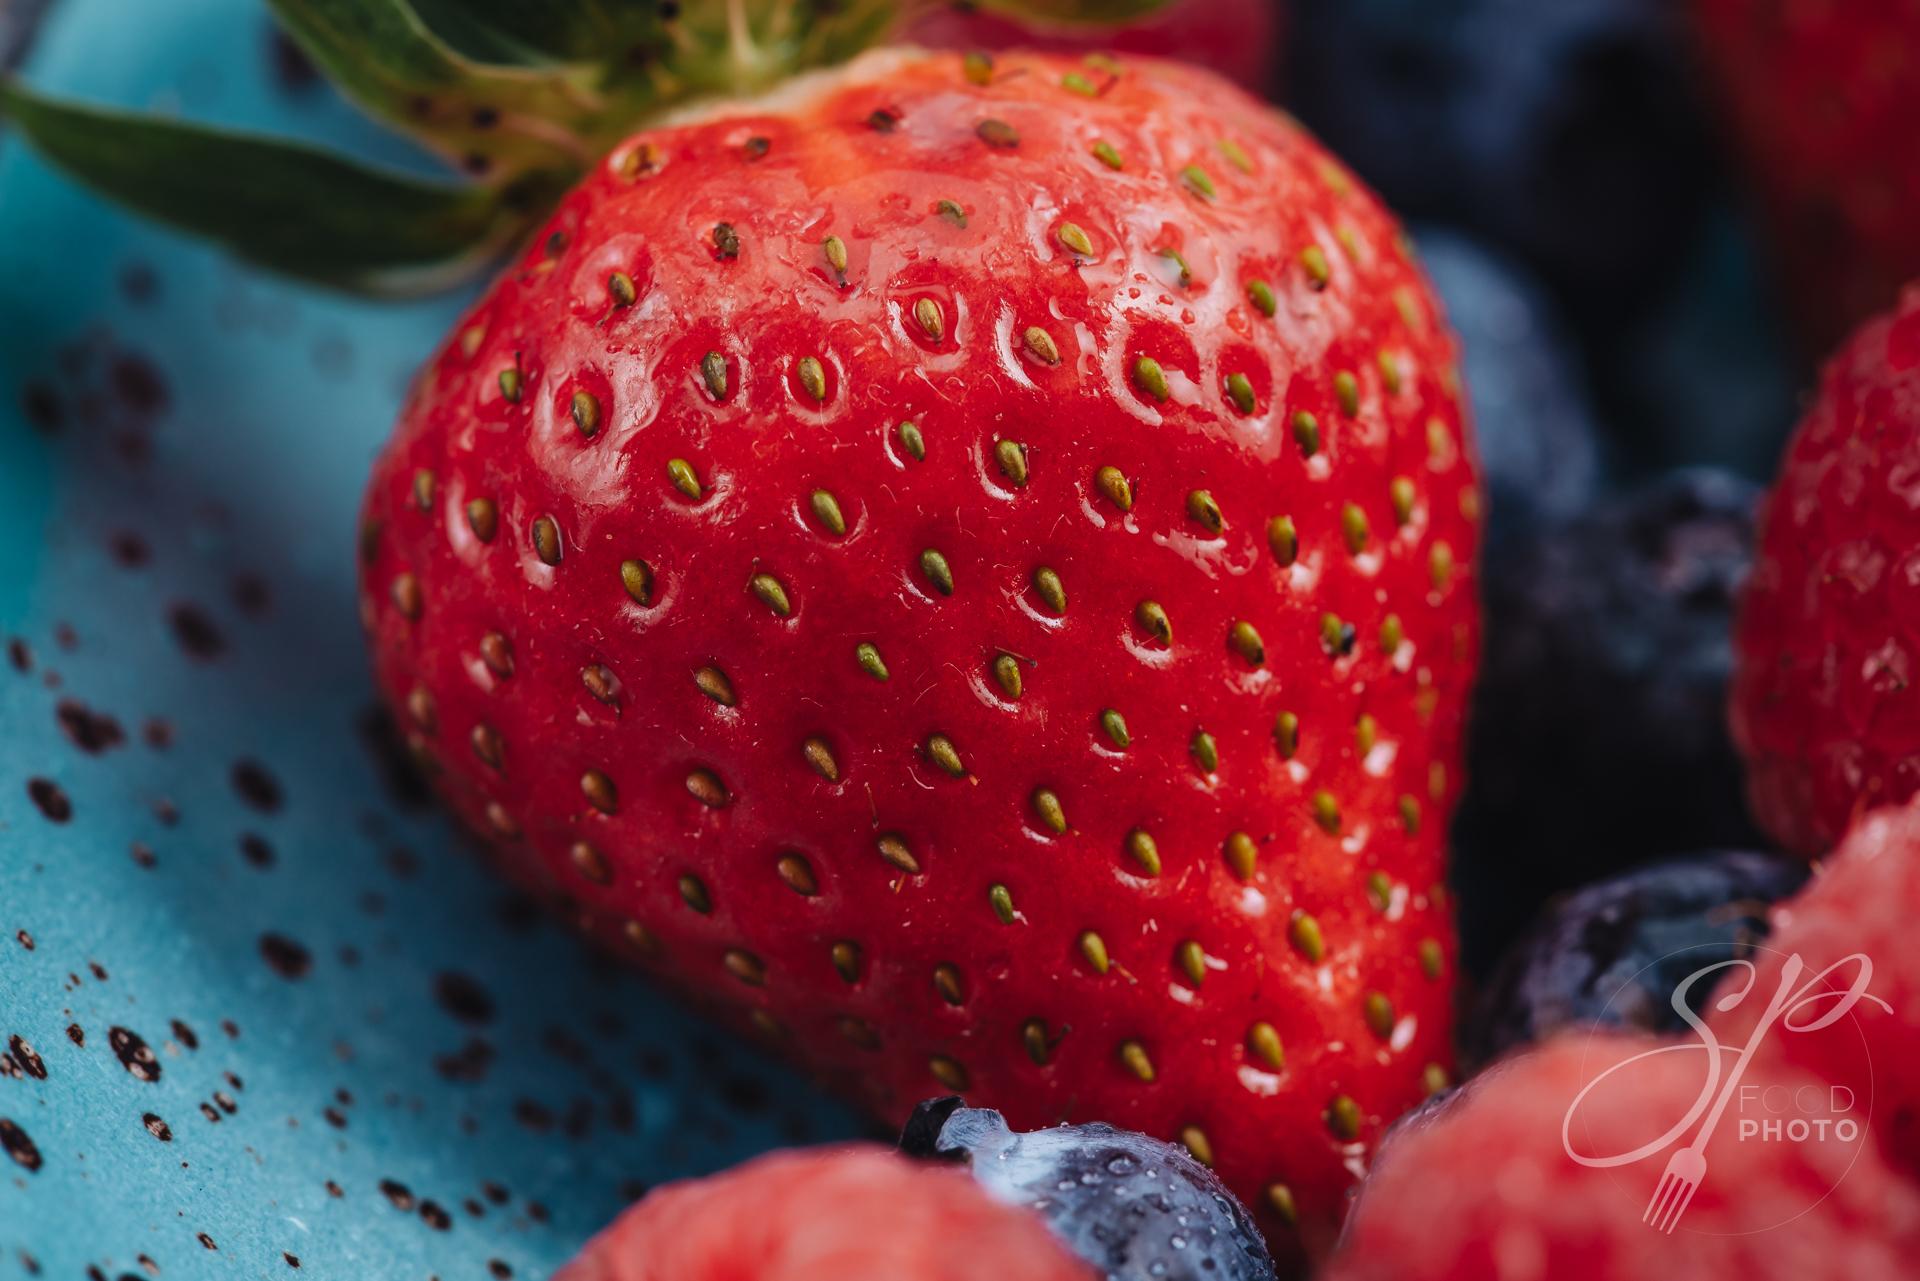 Beautiful macro of a fresh strawberry at breakfast